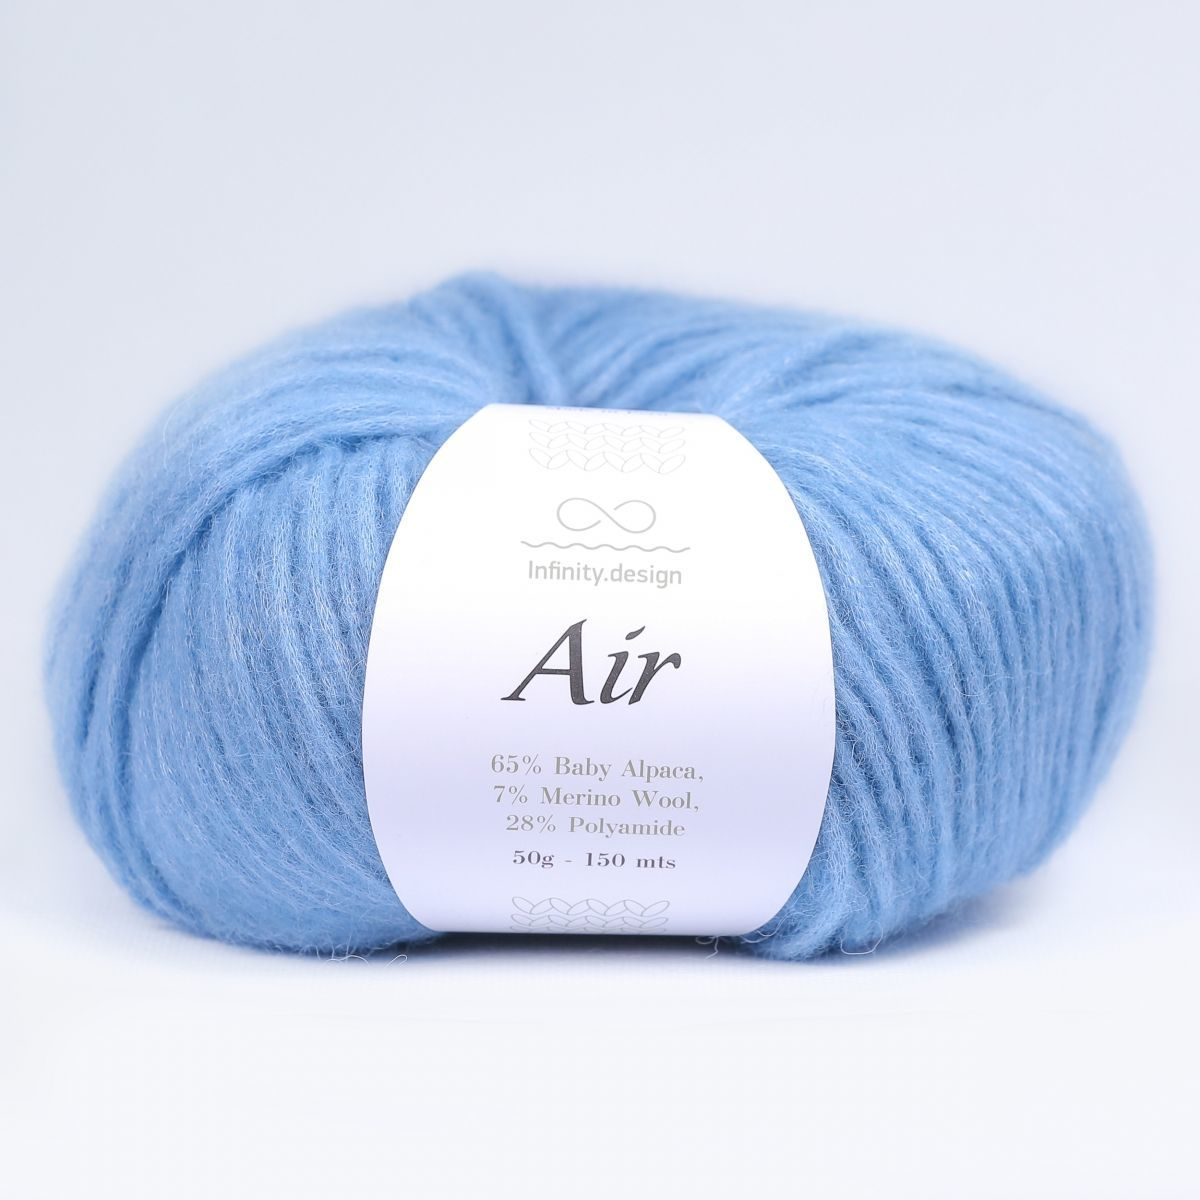 Пряжа Infinity Air 6052 джинс